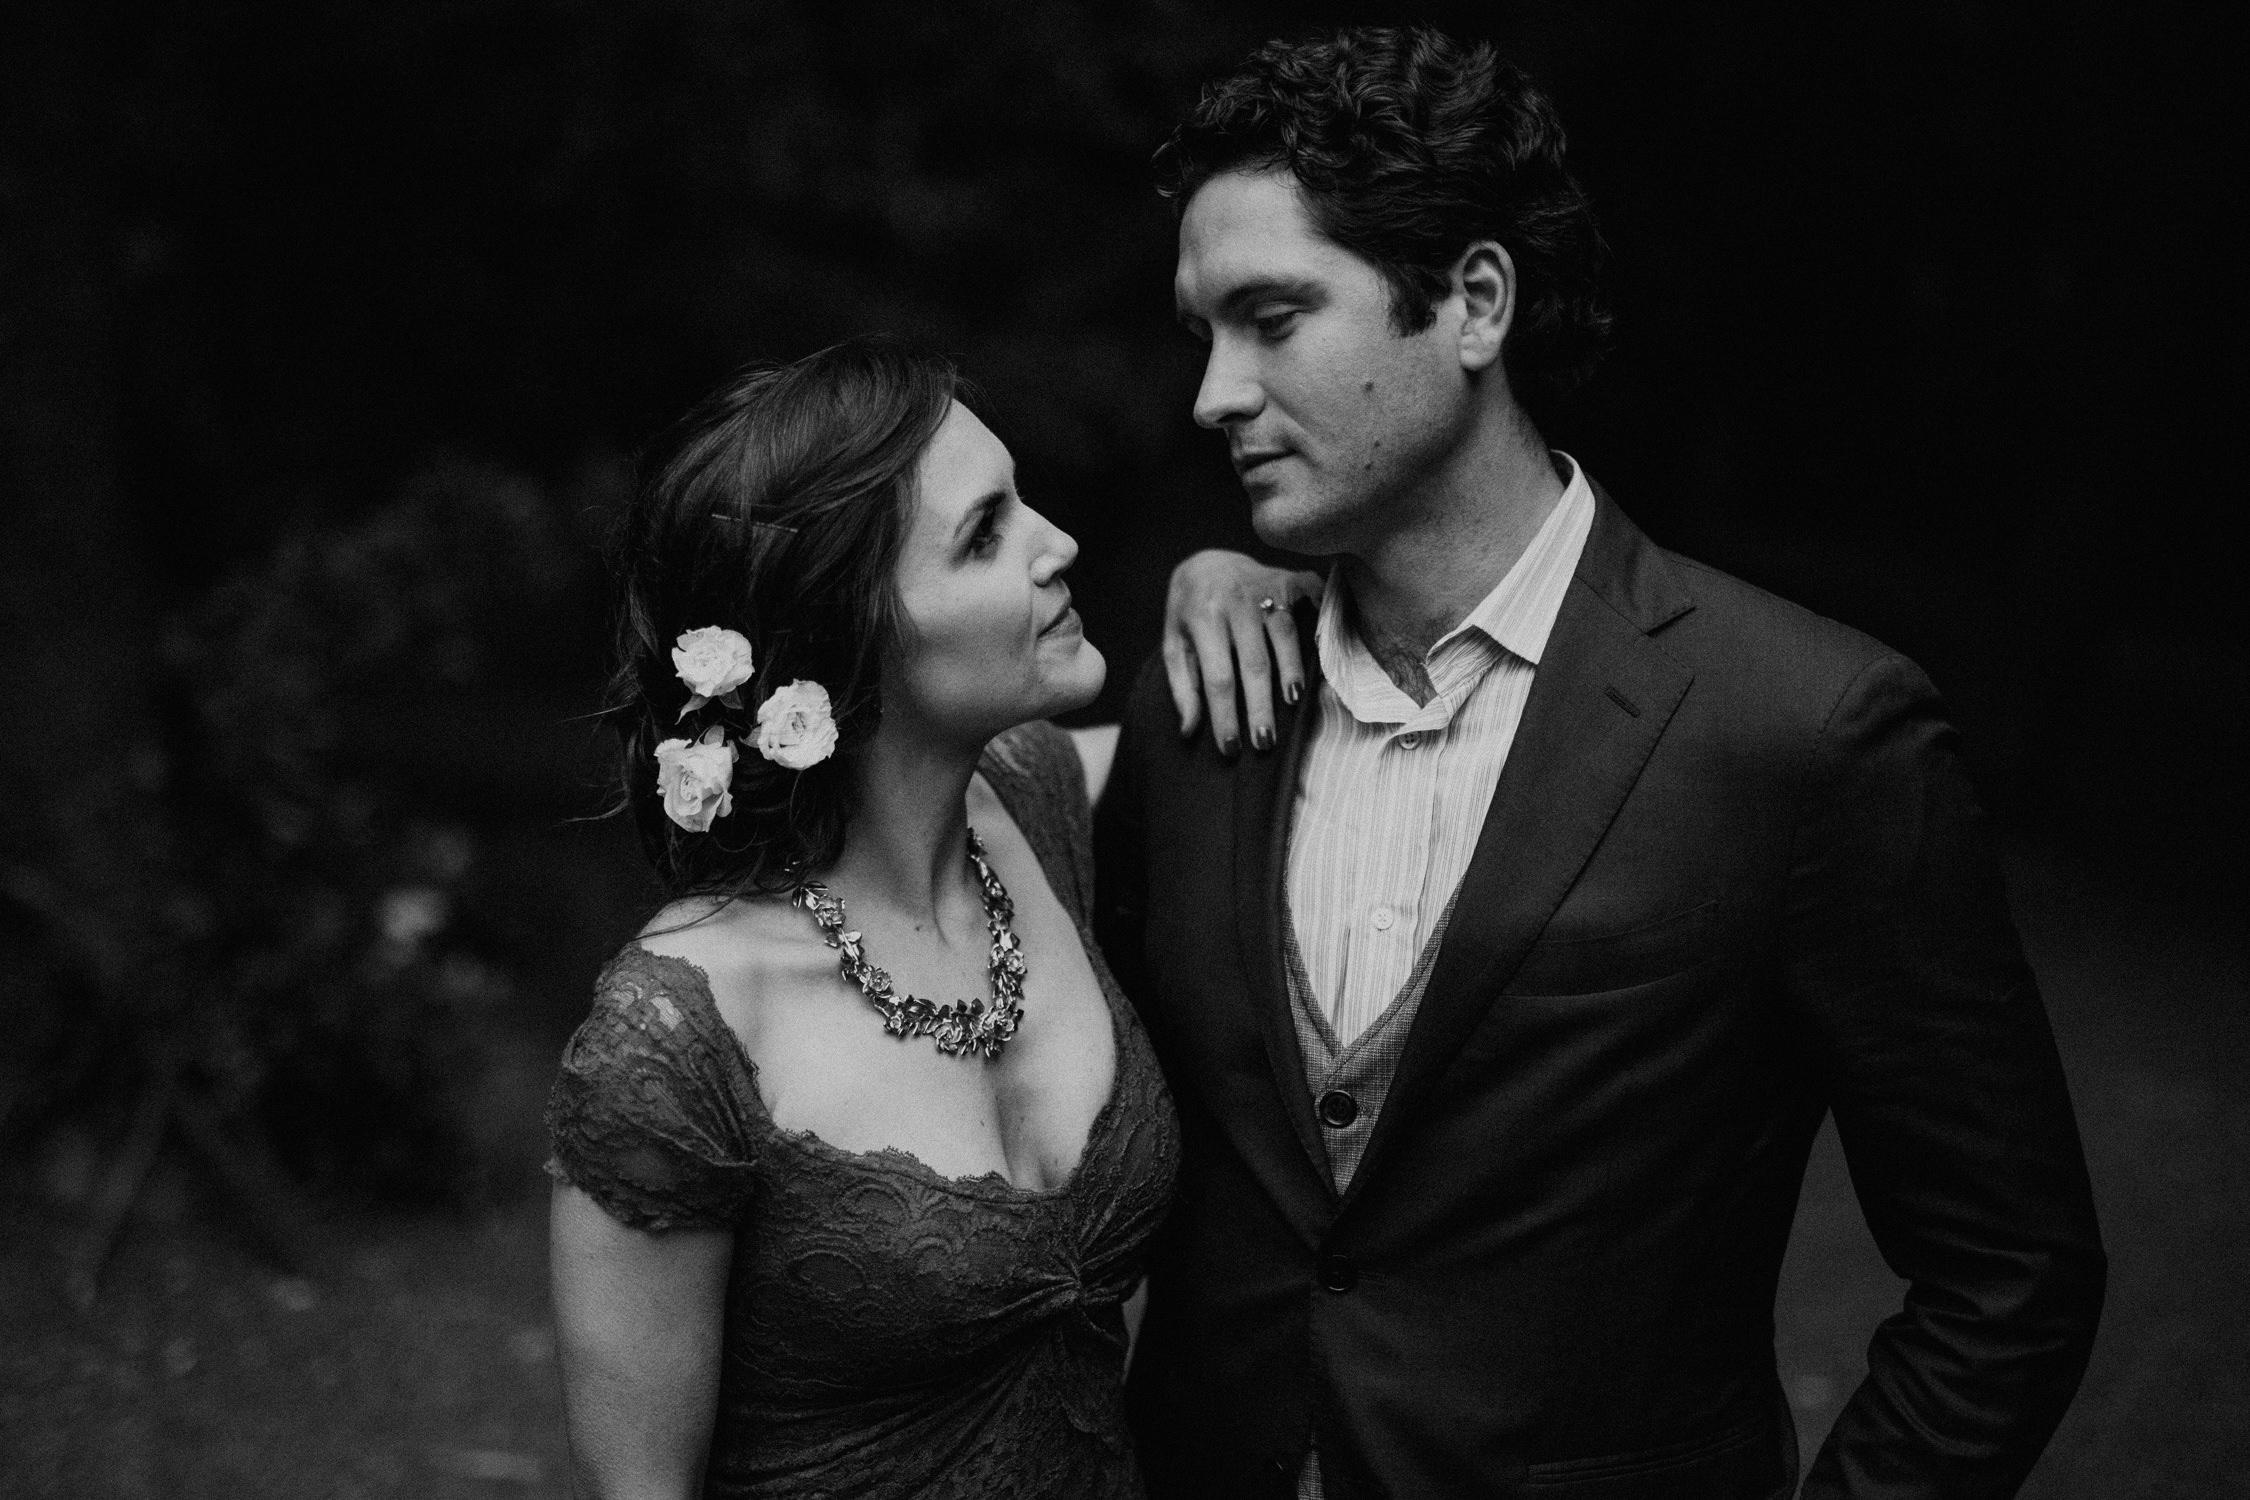 couple-intimate-engagement-session-mt-tam-67.jpg